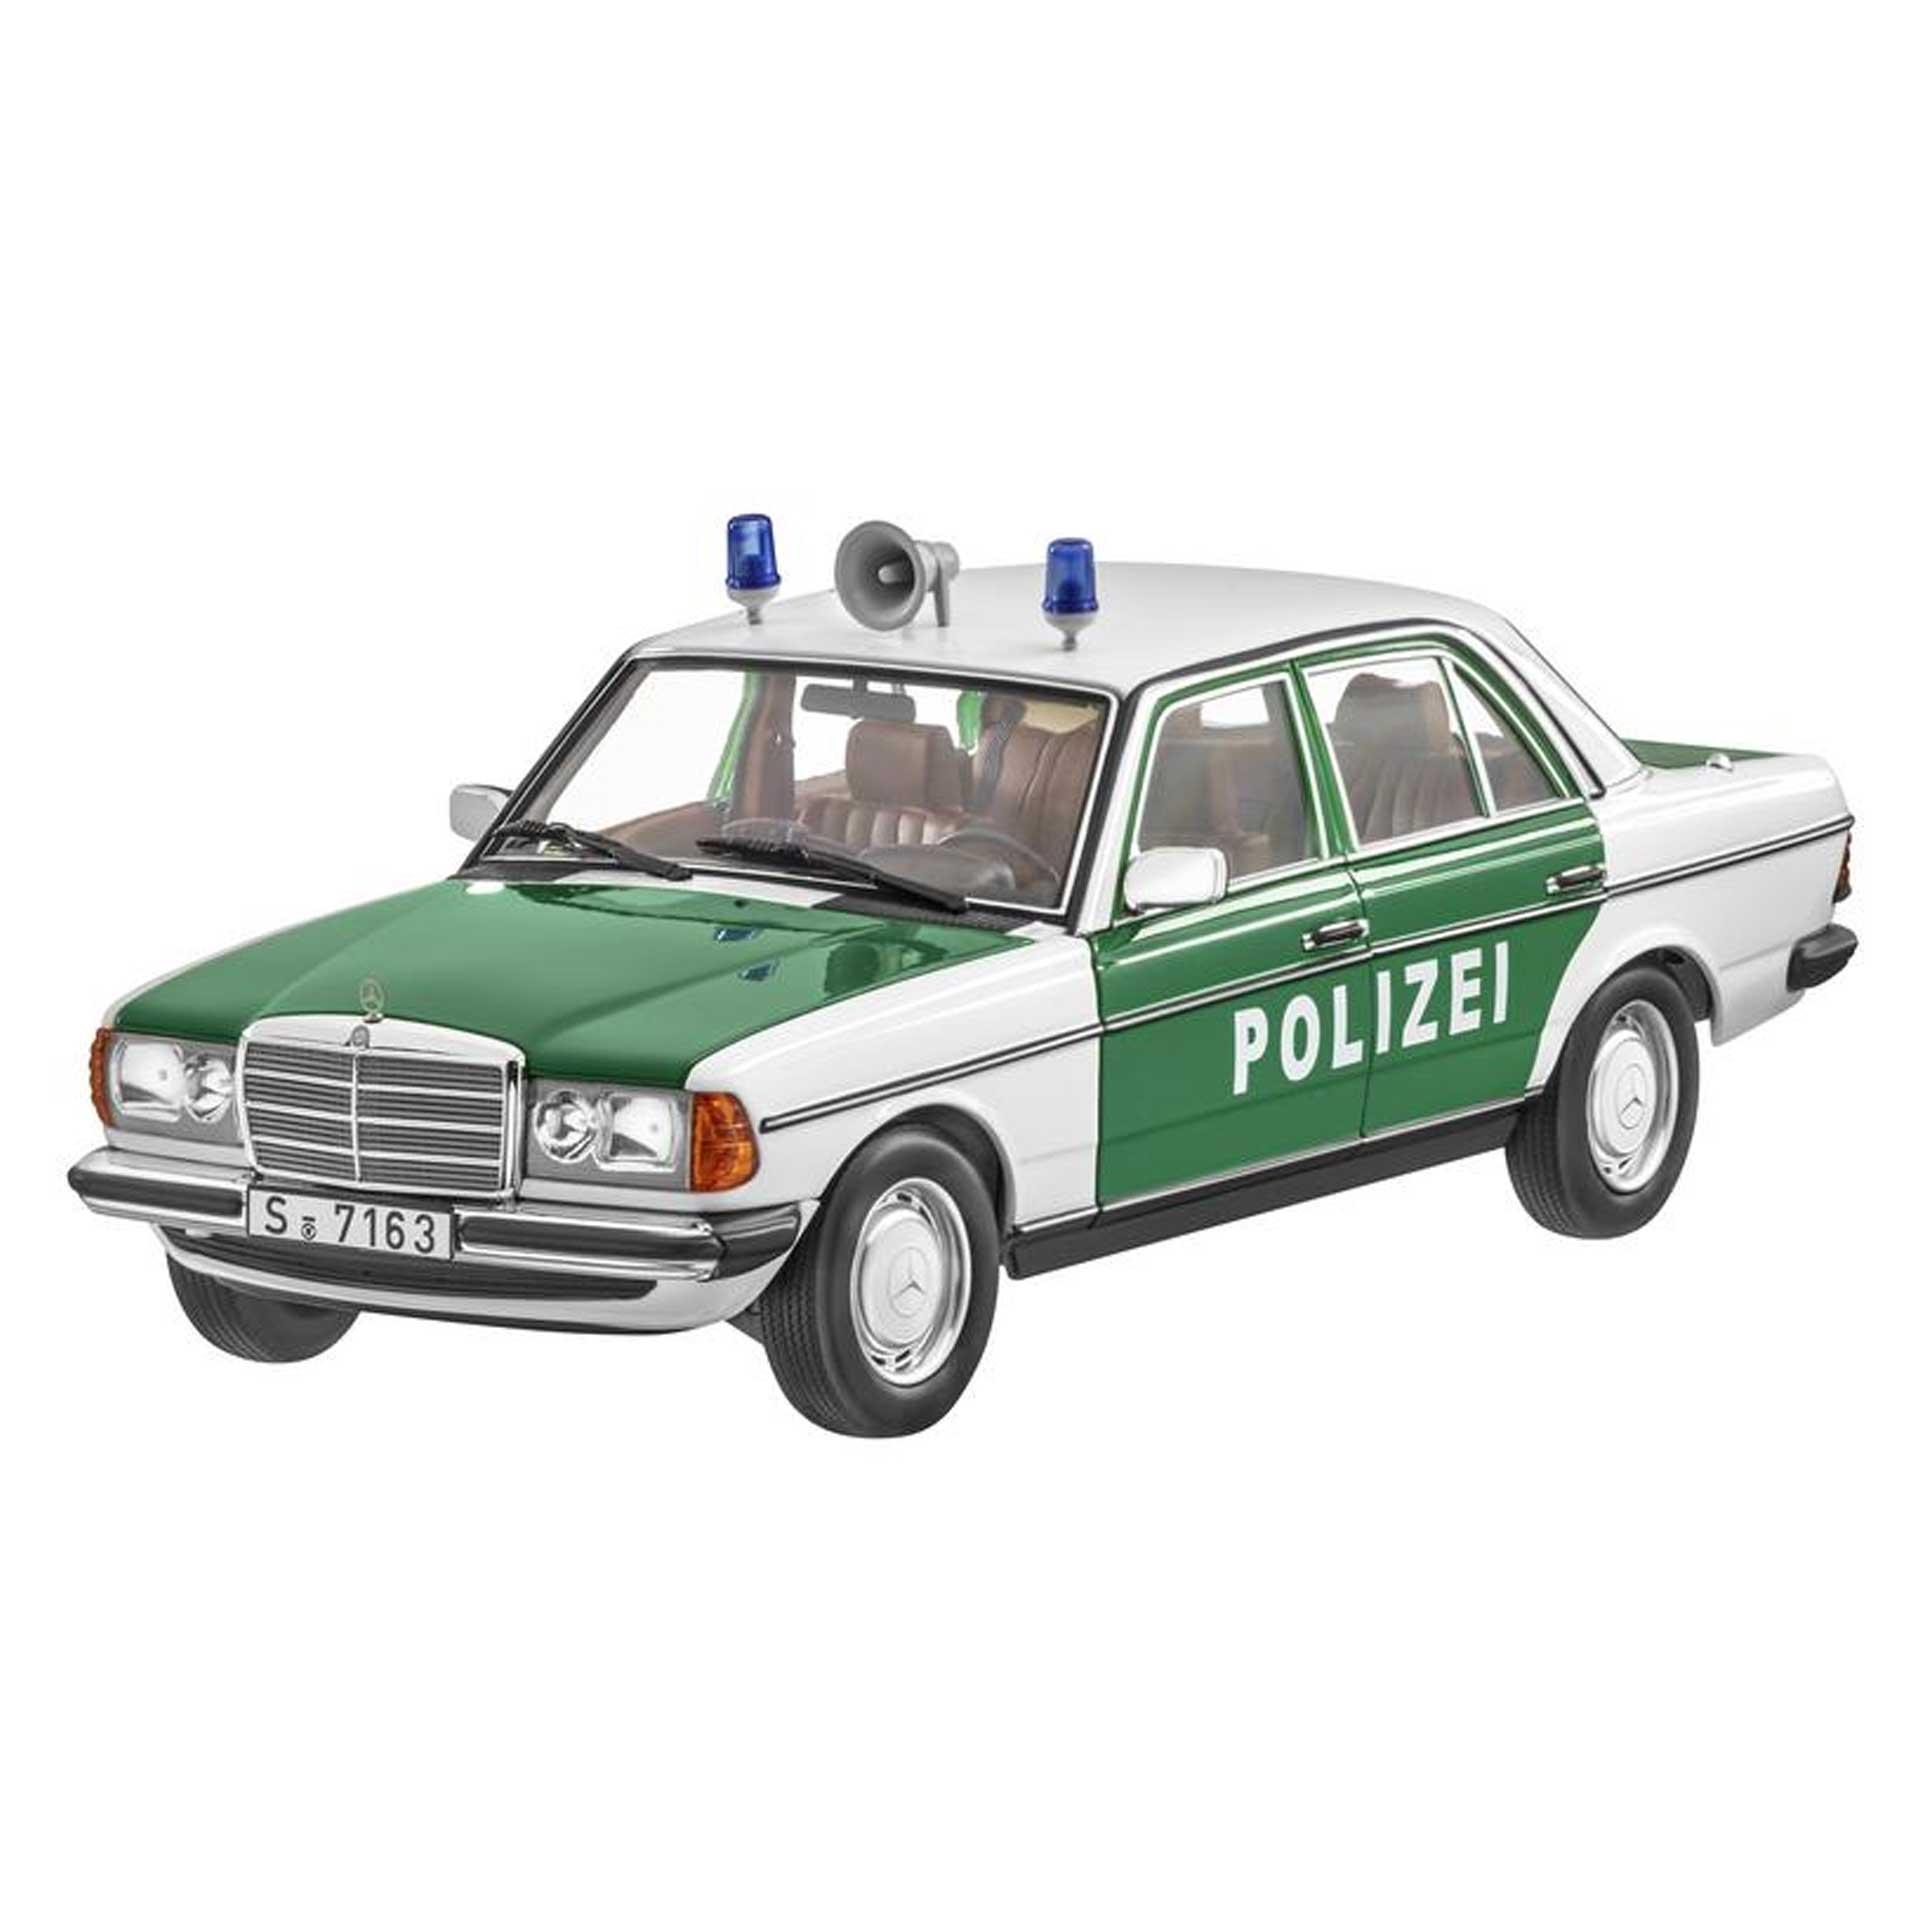 Mercedes-Benz Modellauto 200 Polizei W123 (1980-1985) 1:18